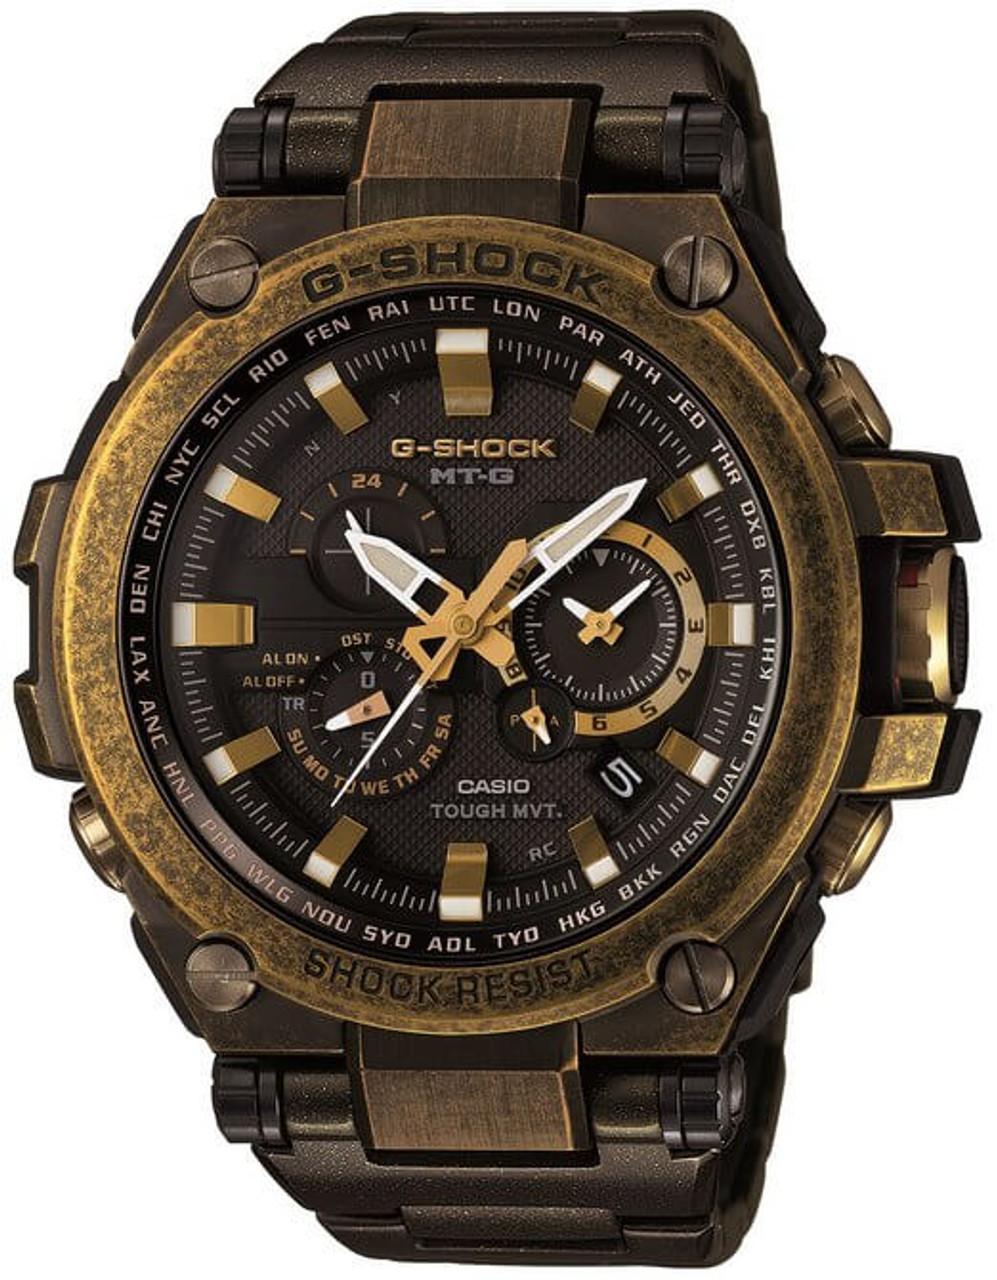 Casio G-Shock MTG-S1000BS-1AJR Basel World Limited